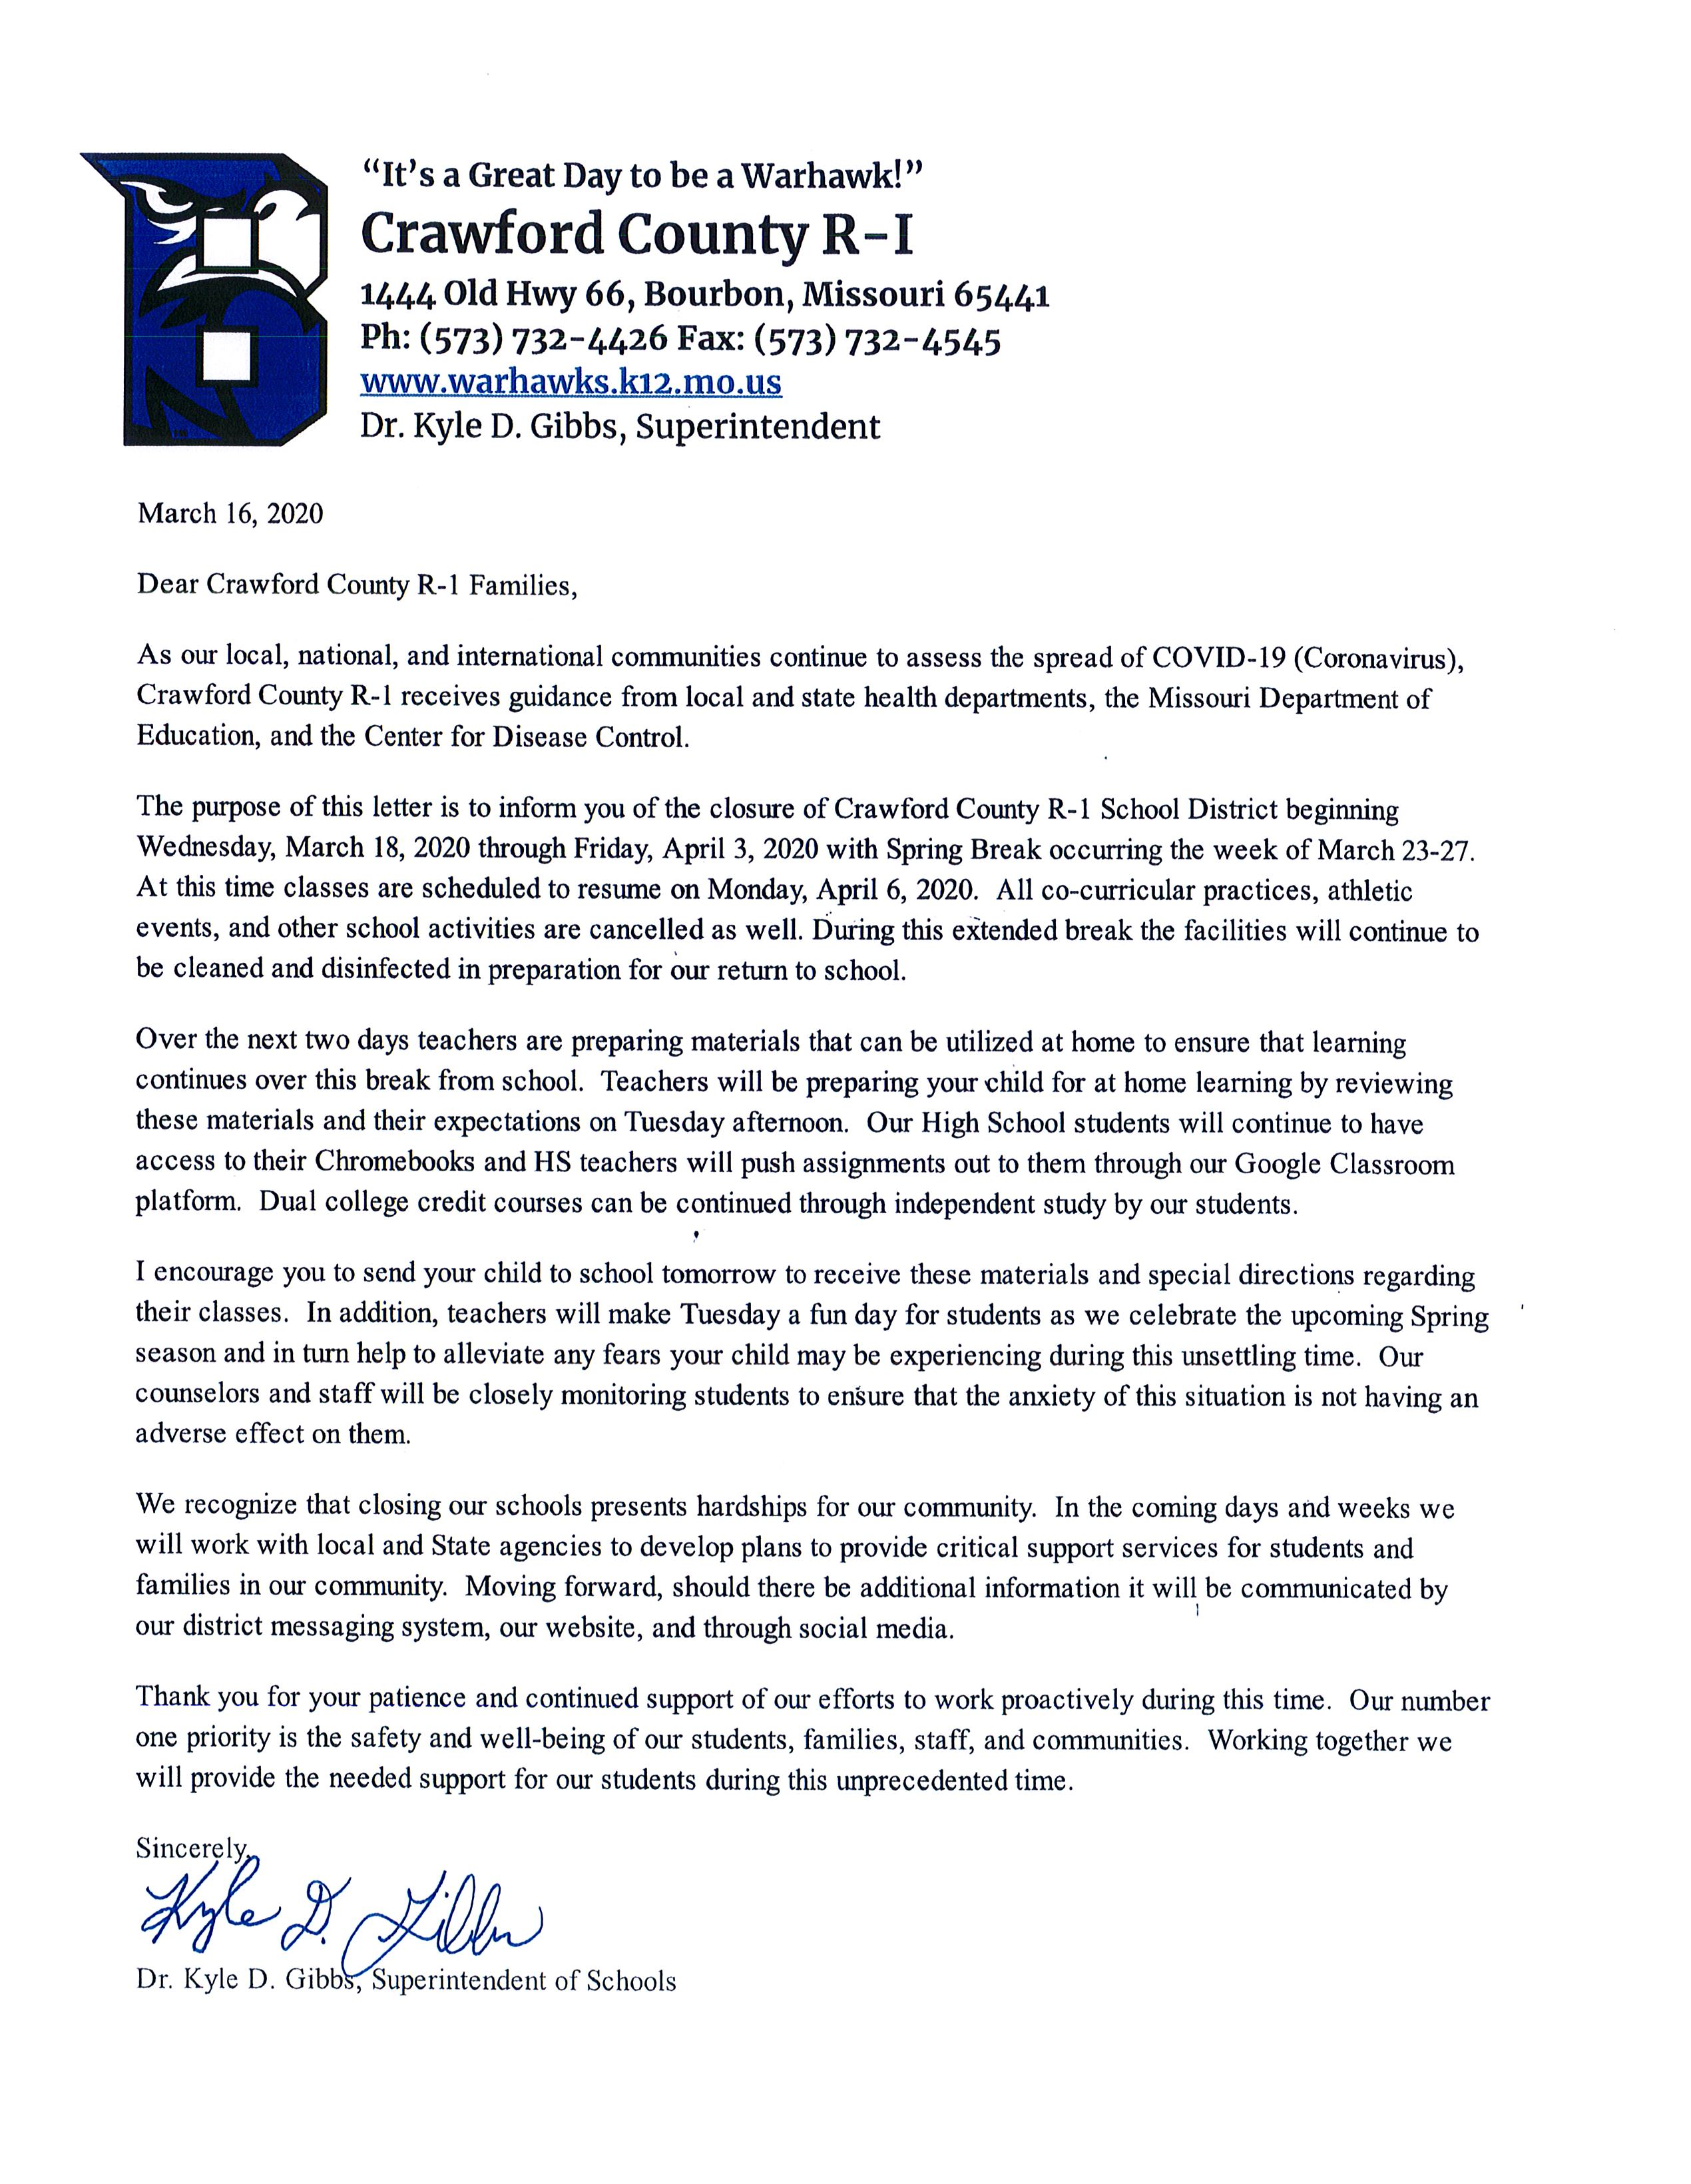 School Closing/Covid-19 Information